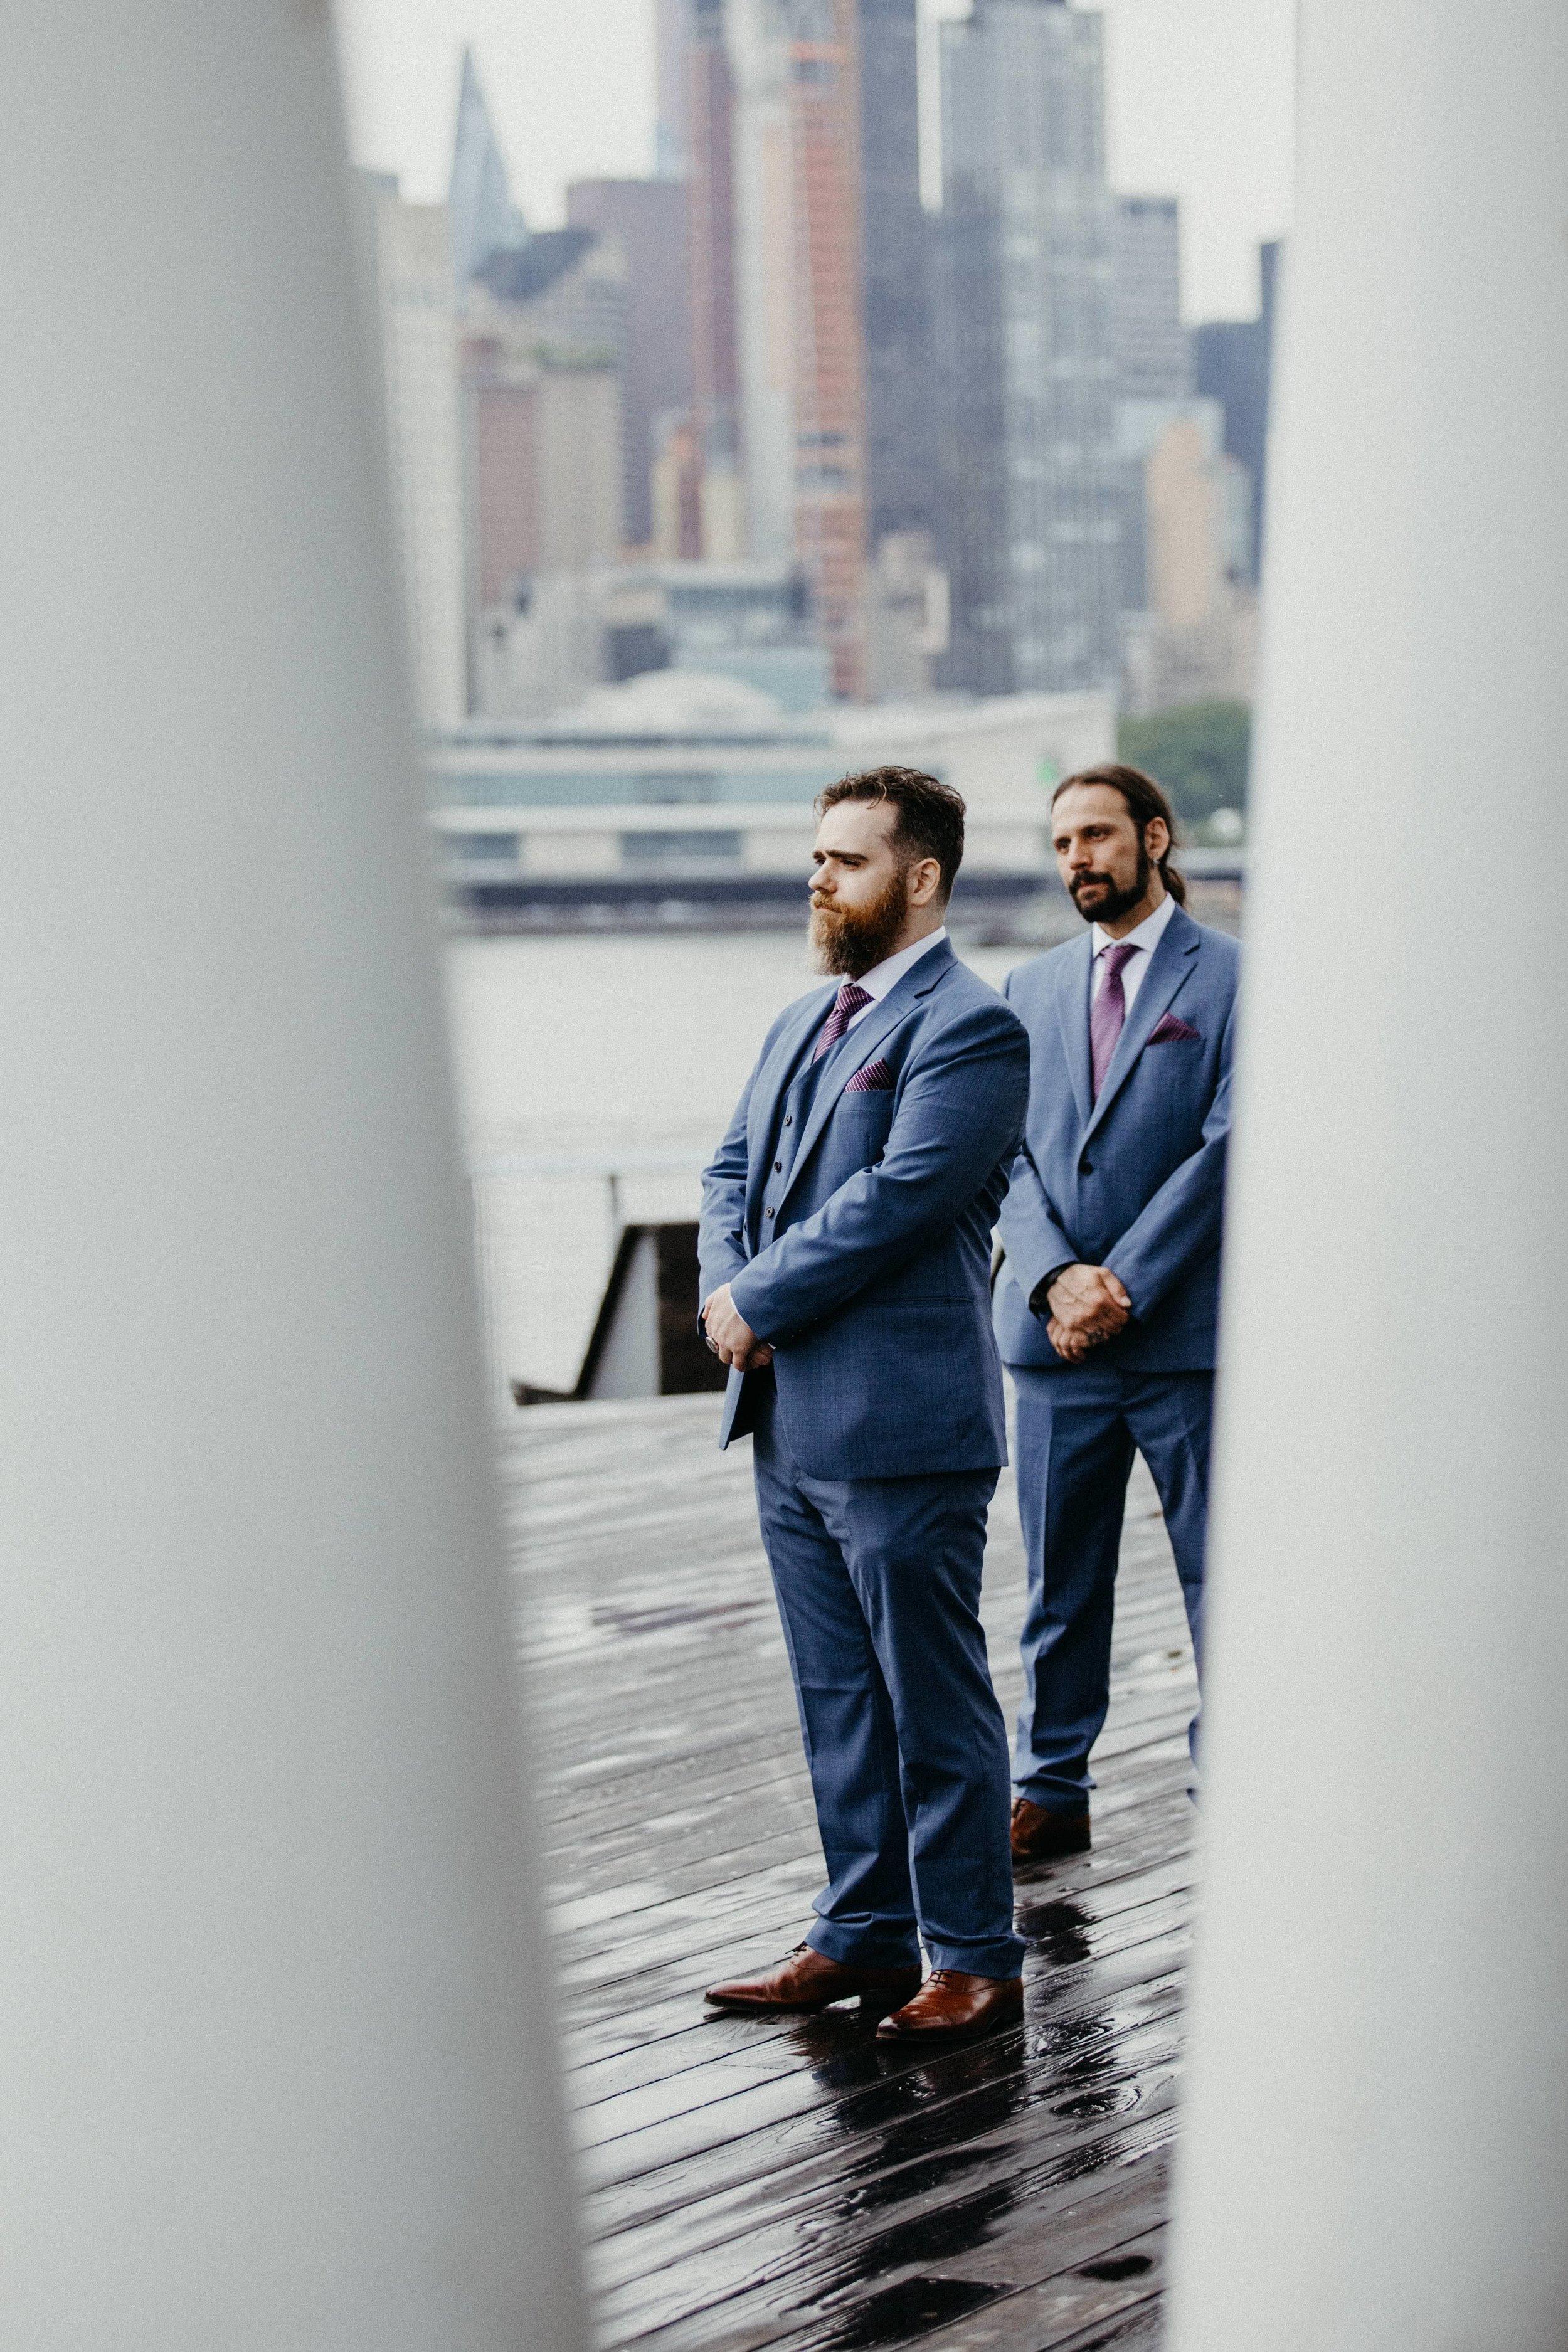 Sevlynn-Photography-Wedding-LIC-Landing-Maiella-NYC-42.jpg